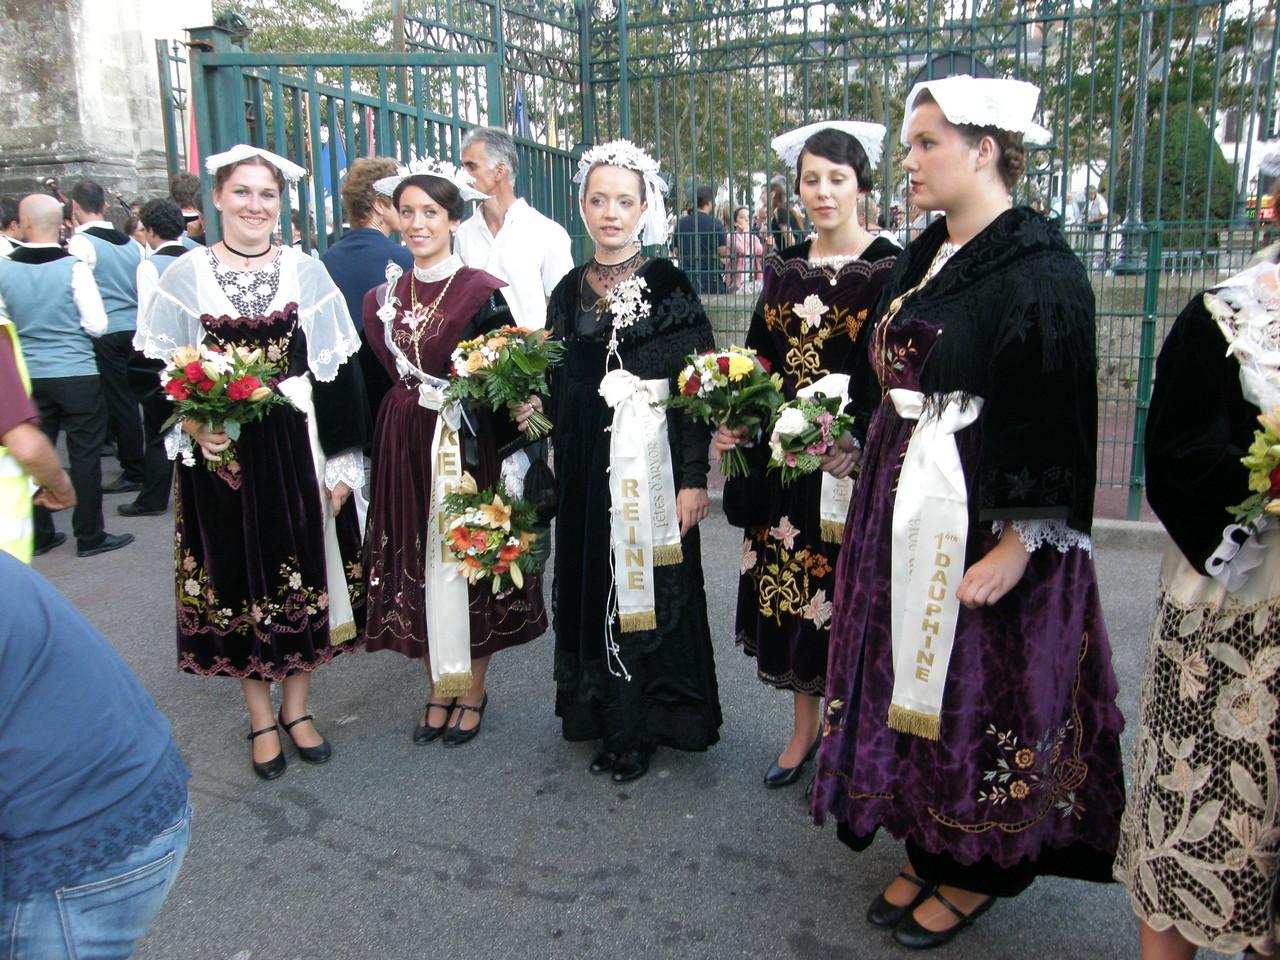 Les reines d'Arvor et Dauphines 2012-2013